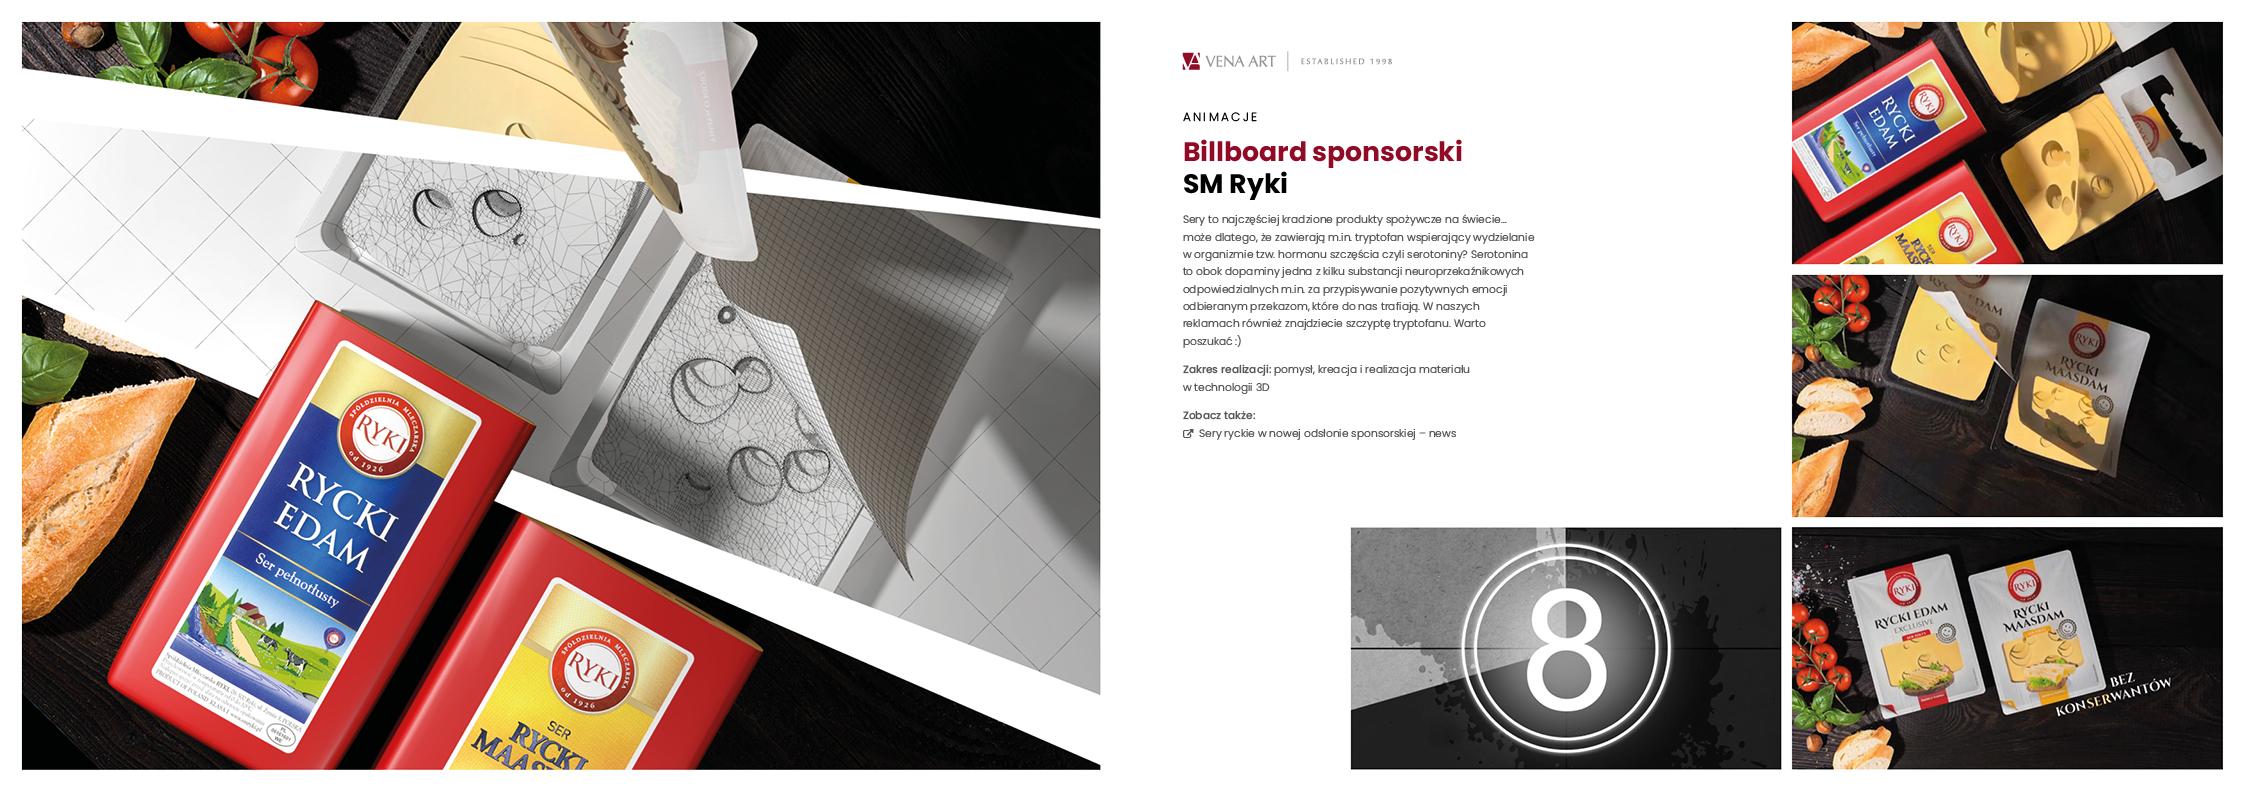 Billboard sponsorski —SM Ryki